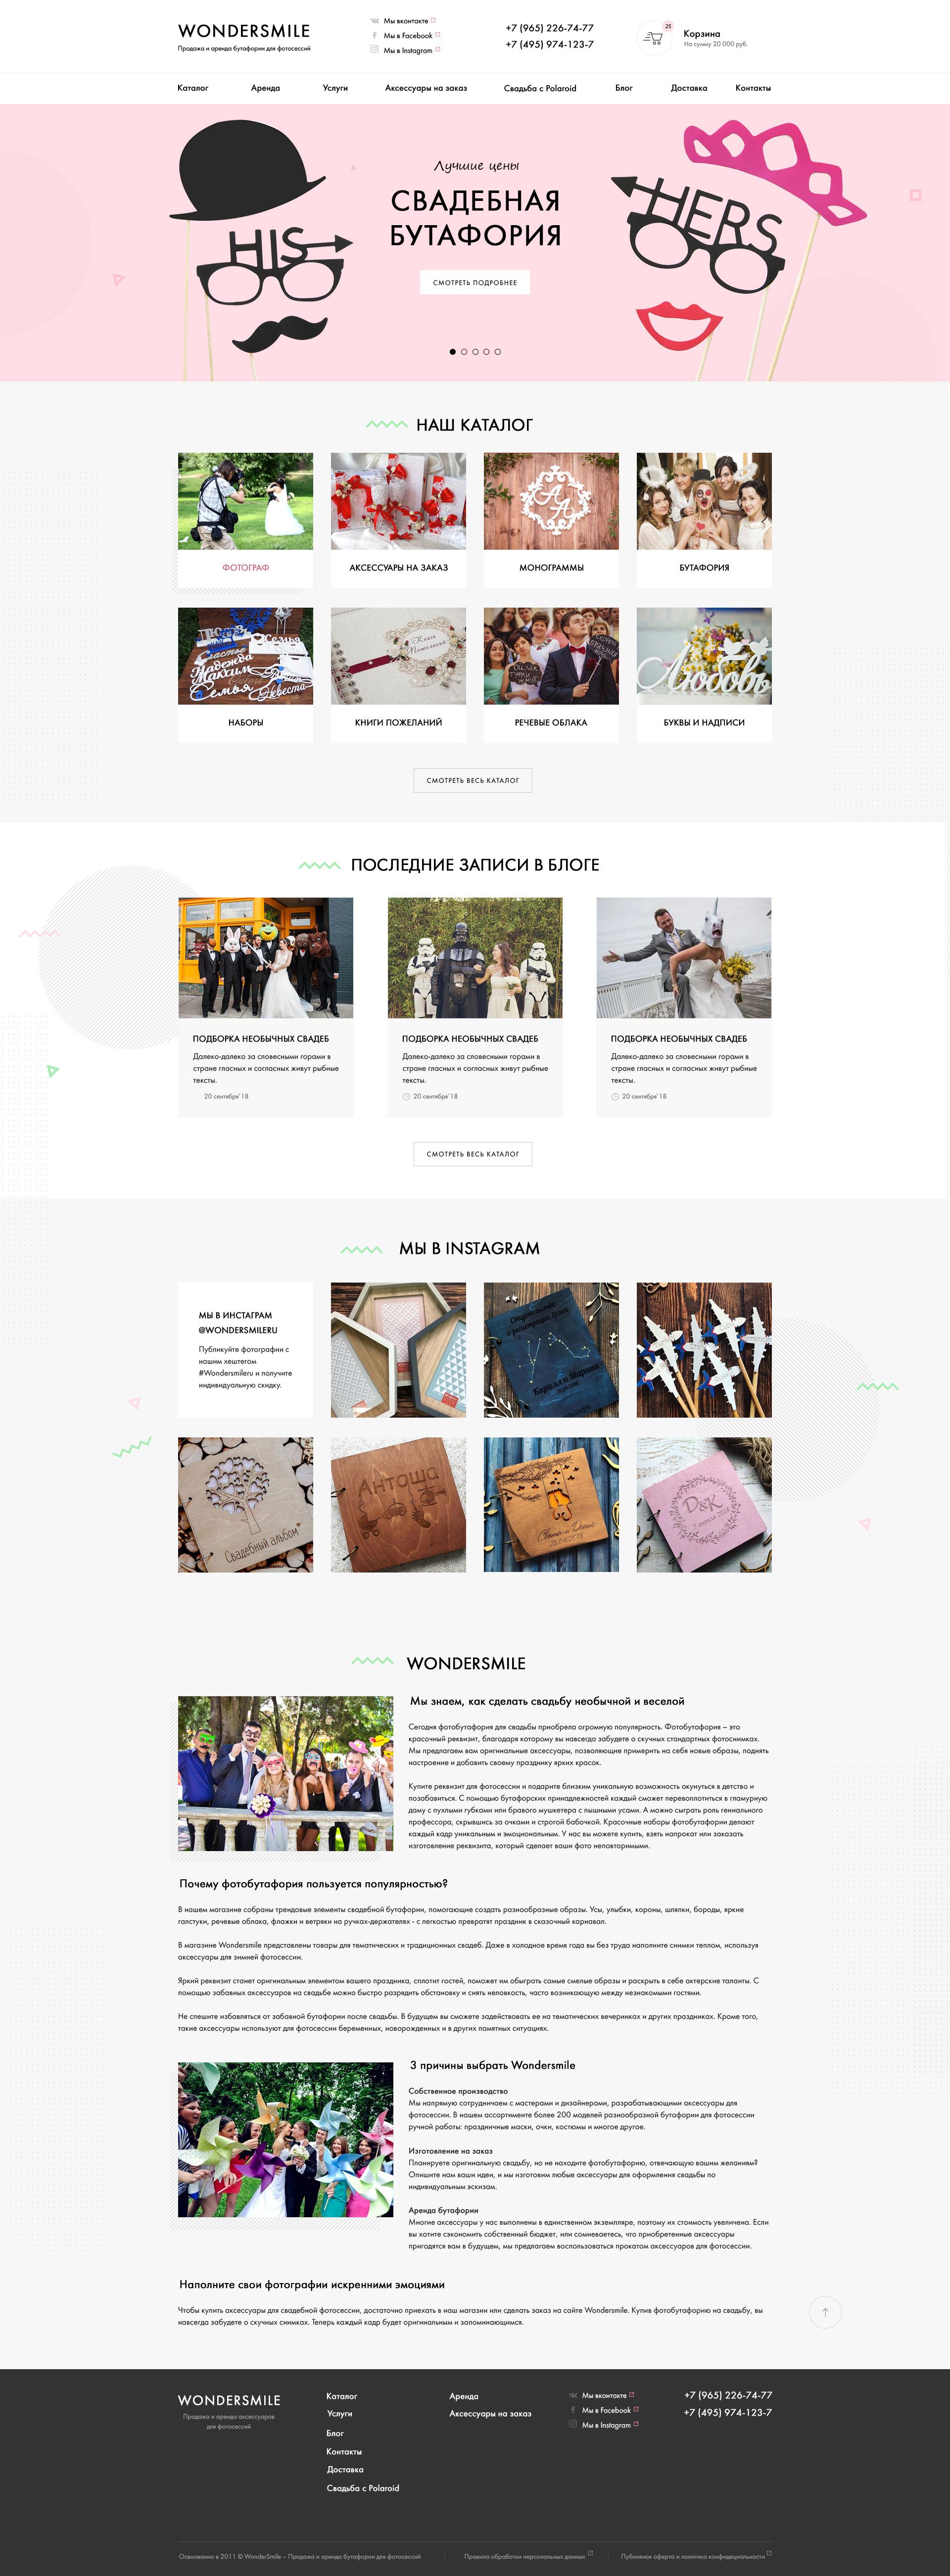 wondersmile.ru — интернет магазин бутафории  для фотосессий на Битриксе